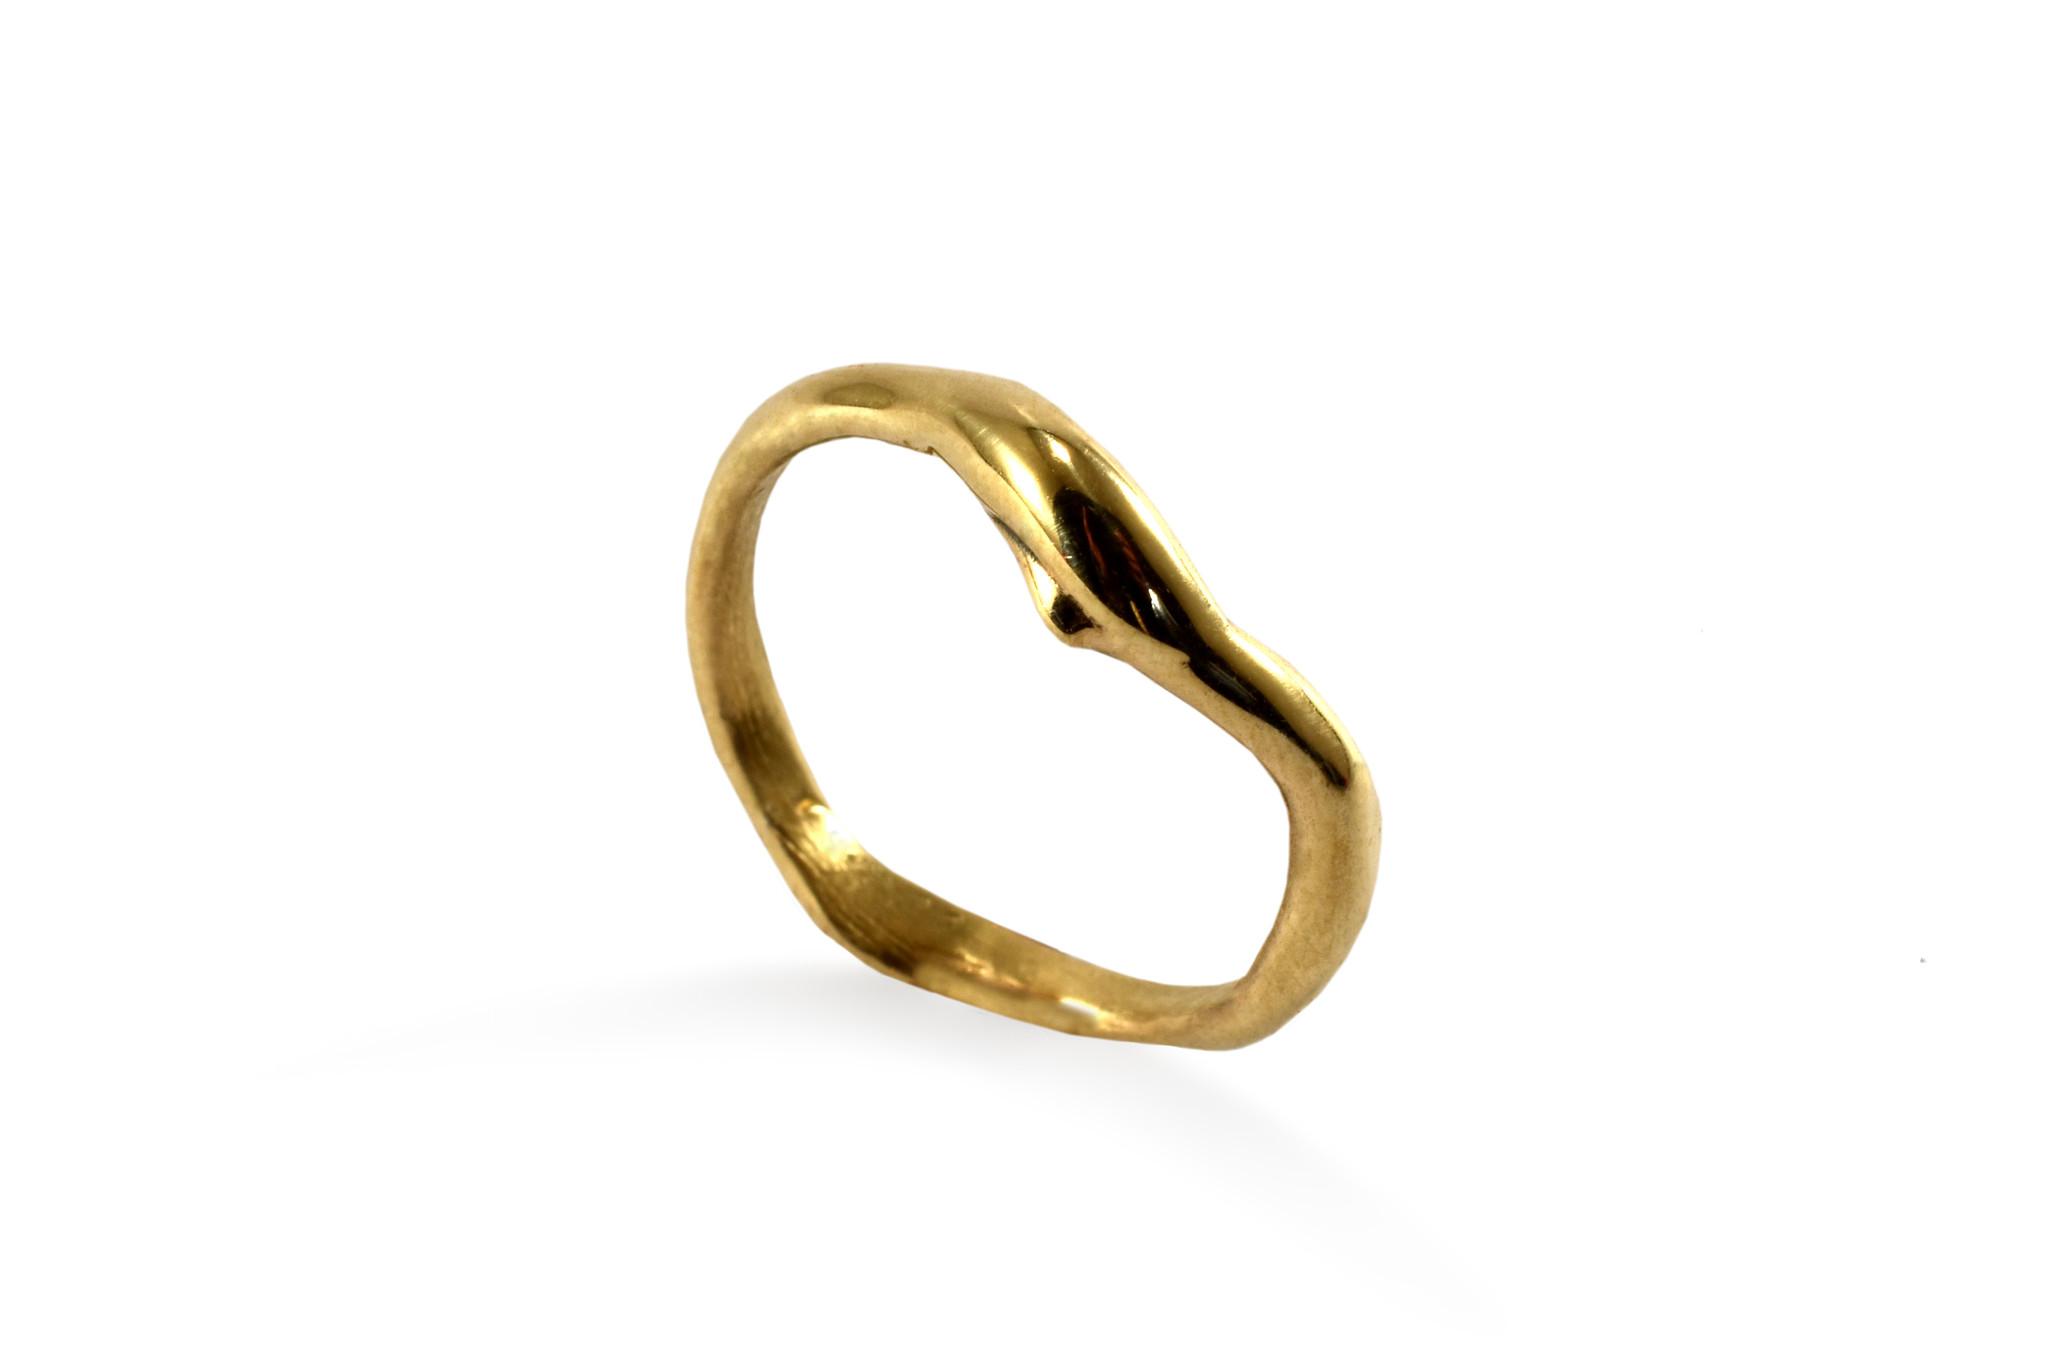 The Drip, Pollock, Big Ring, Jewelry, Art, Handmade, Custom, Unique, Vail, Colorado